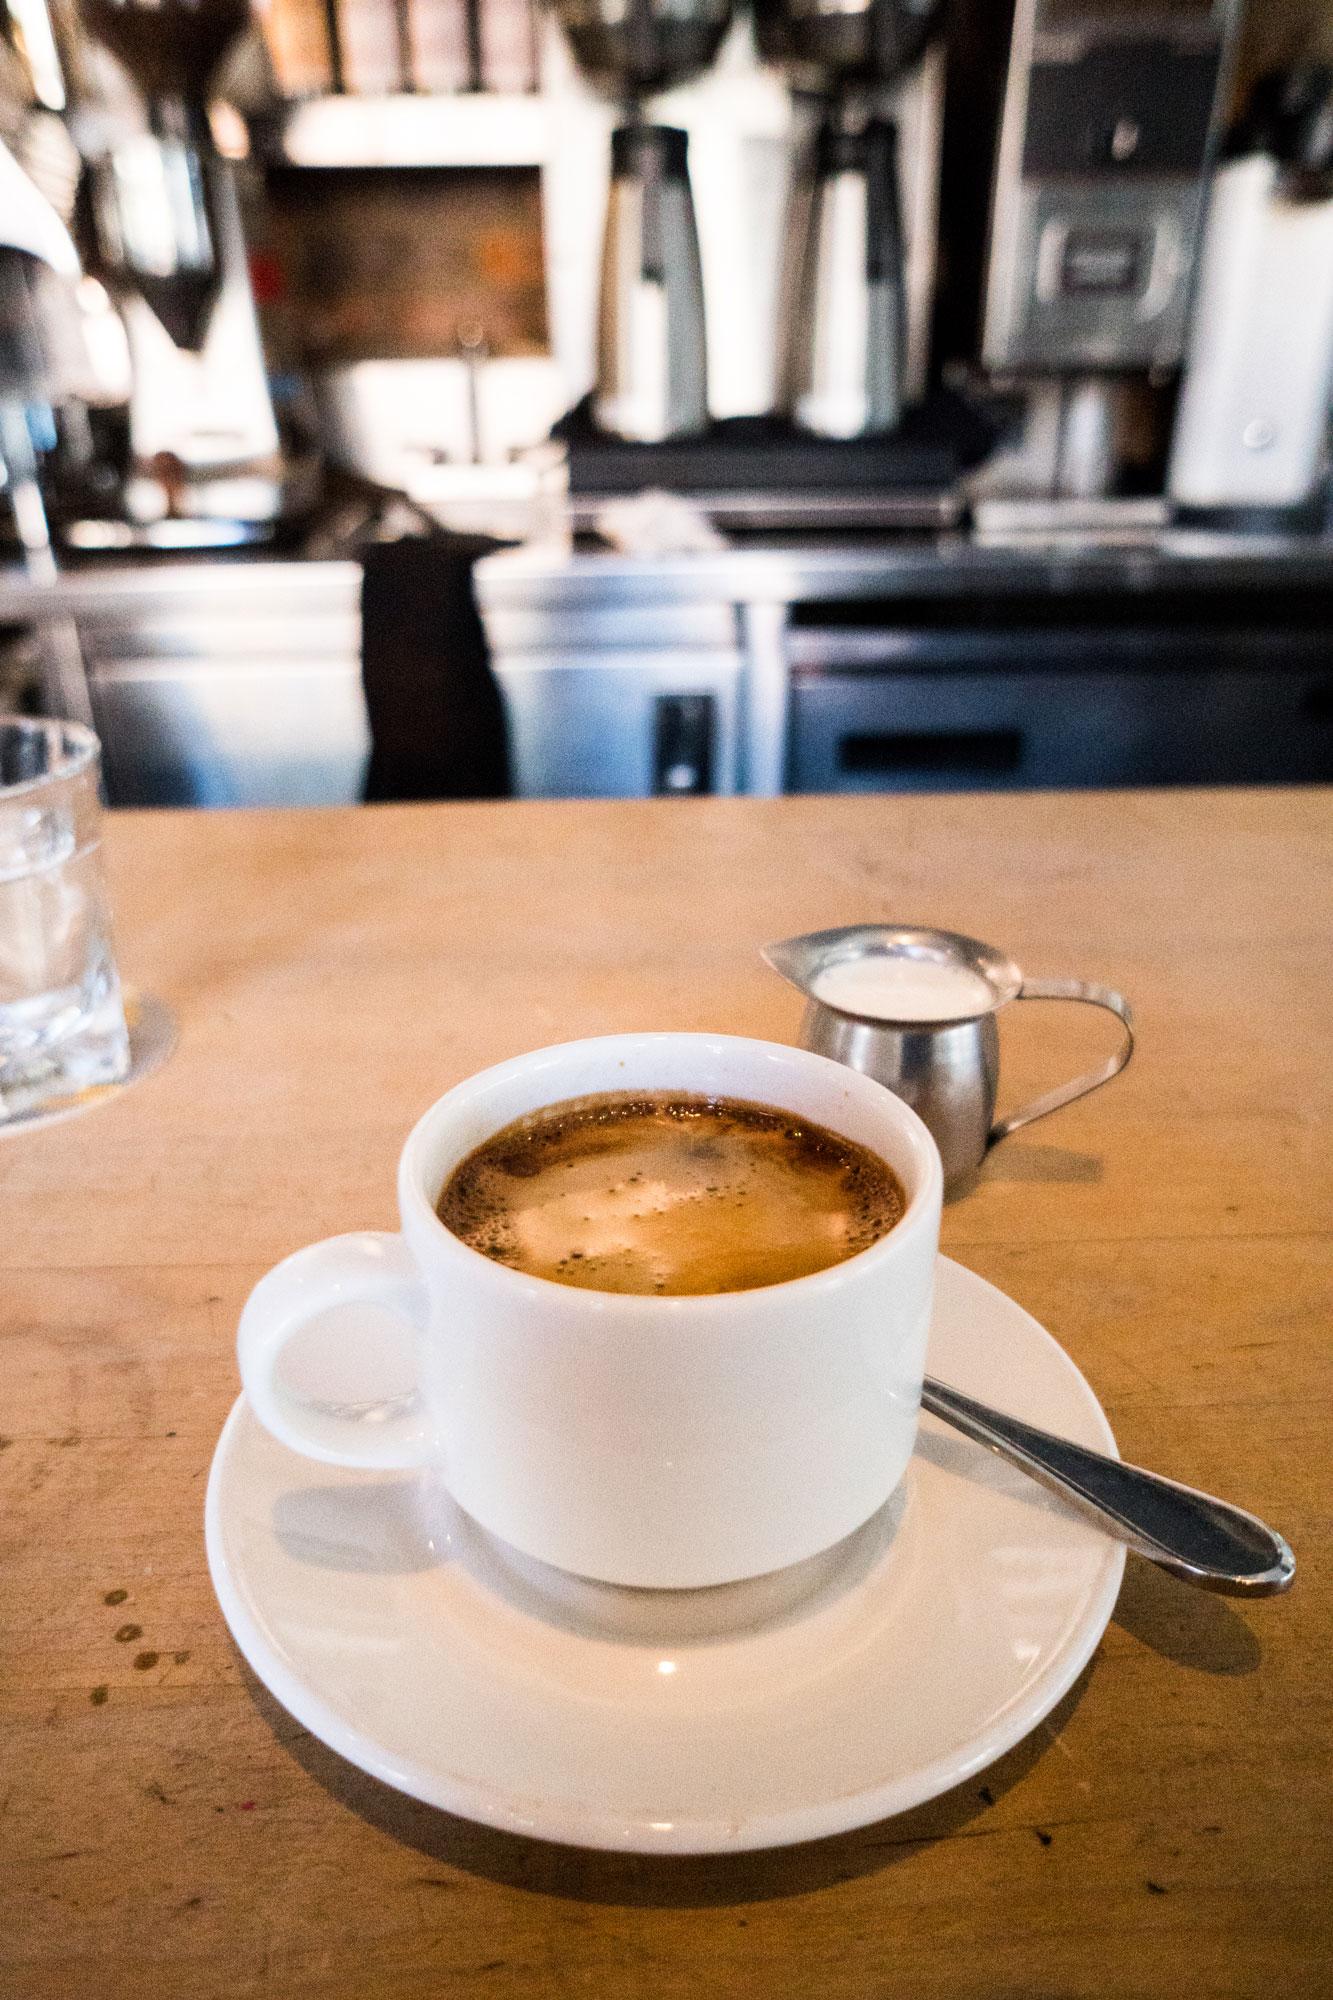 Drake-Hotel-Coffee-Chris-Stenberg-206708.jpg